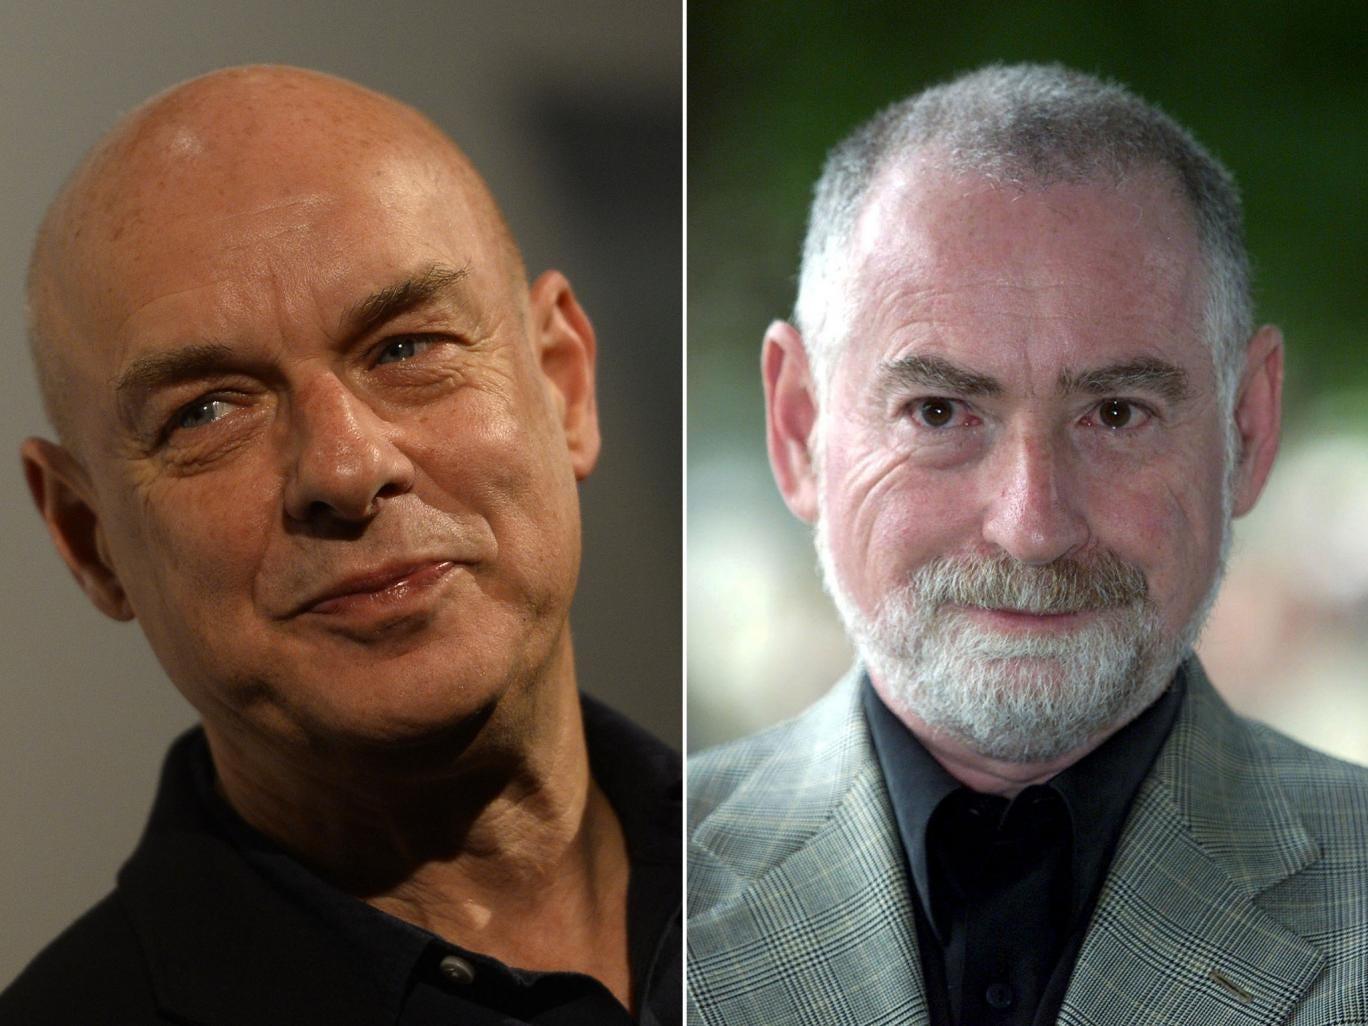 Musician Brian Eno (left) and Peter Schwartz